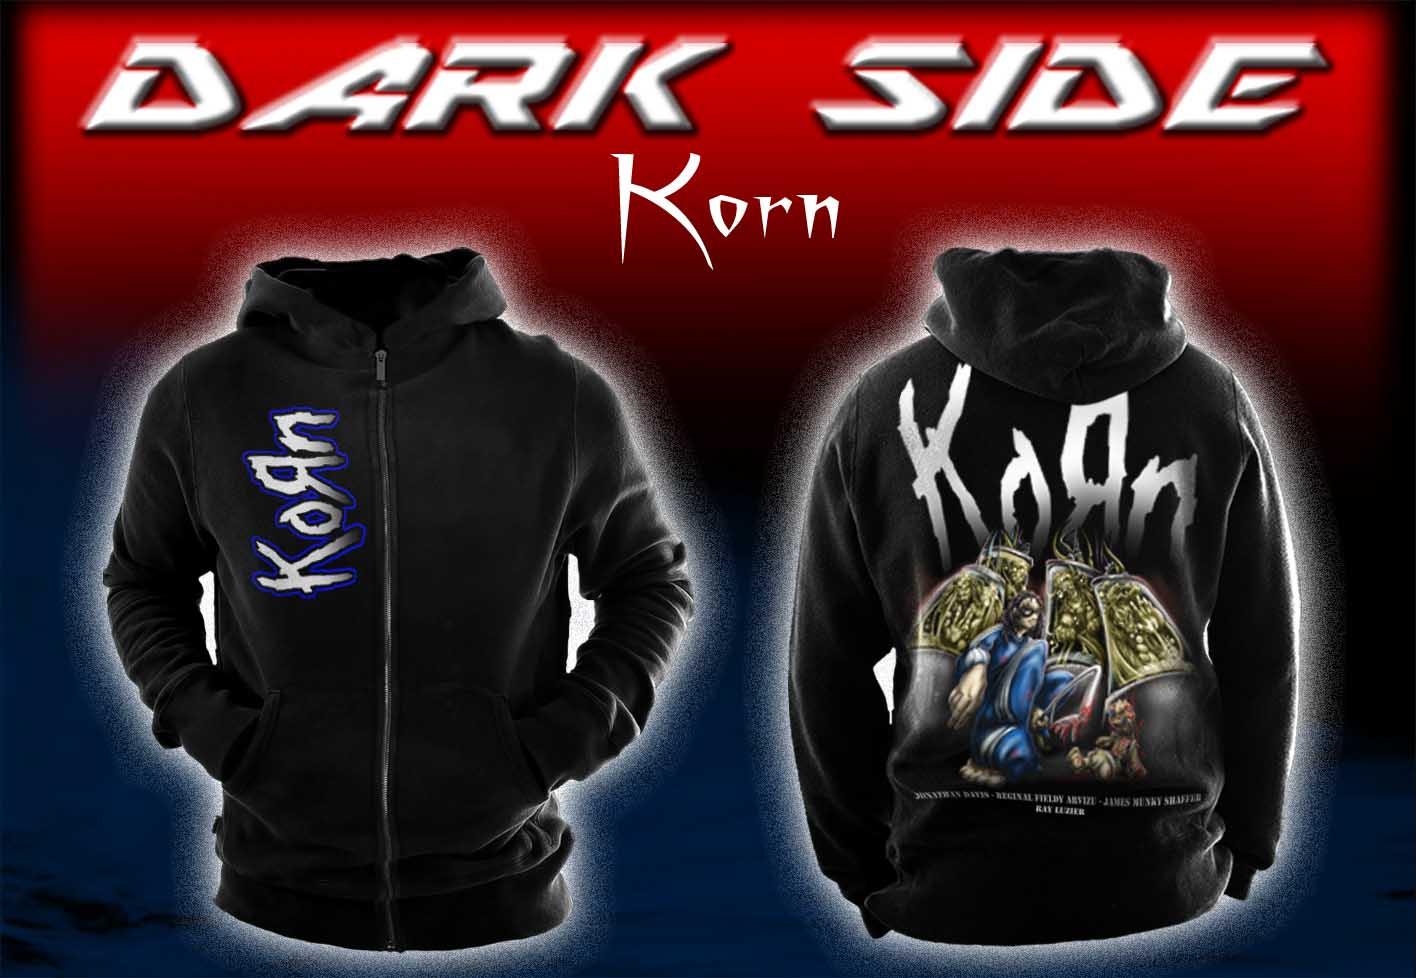 http://3.bp.blogspot.com/_2PmuvH0CT2w/S8e3Oc9oC3I/AAAAAAAAAvc/xAZNkeeTlfM/s1600/Korn.jpg